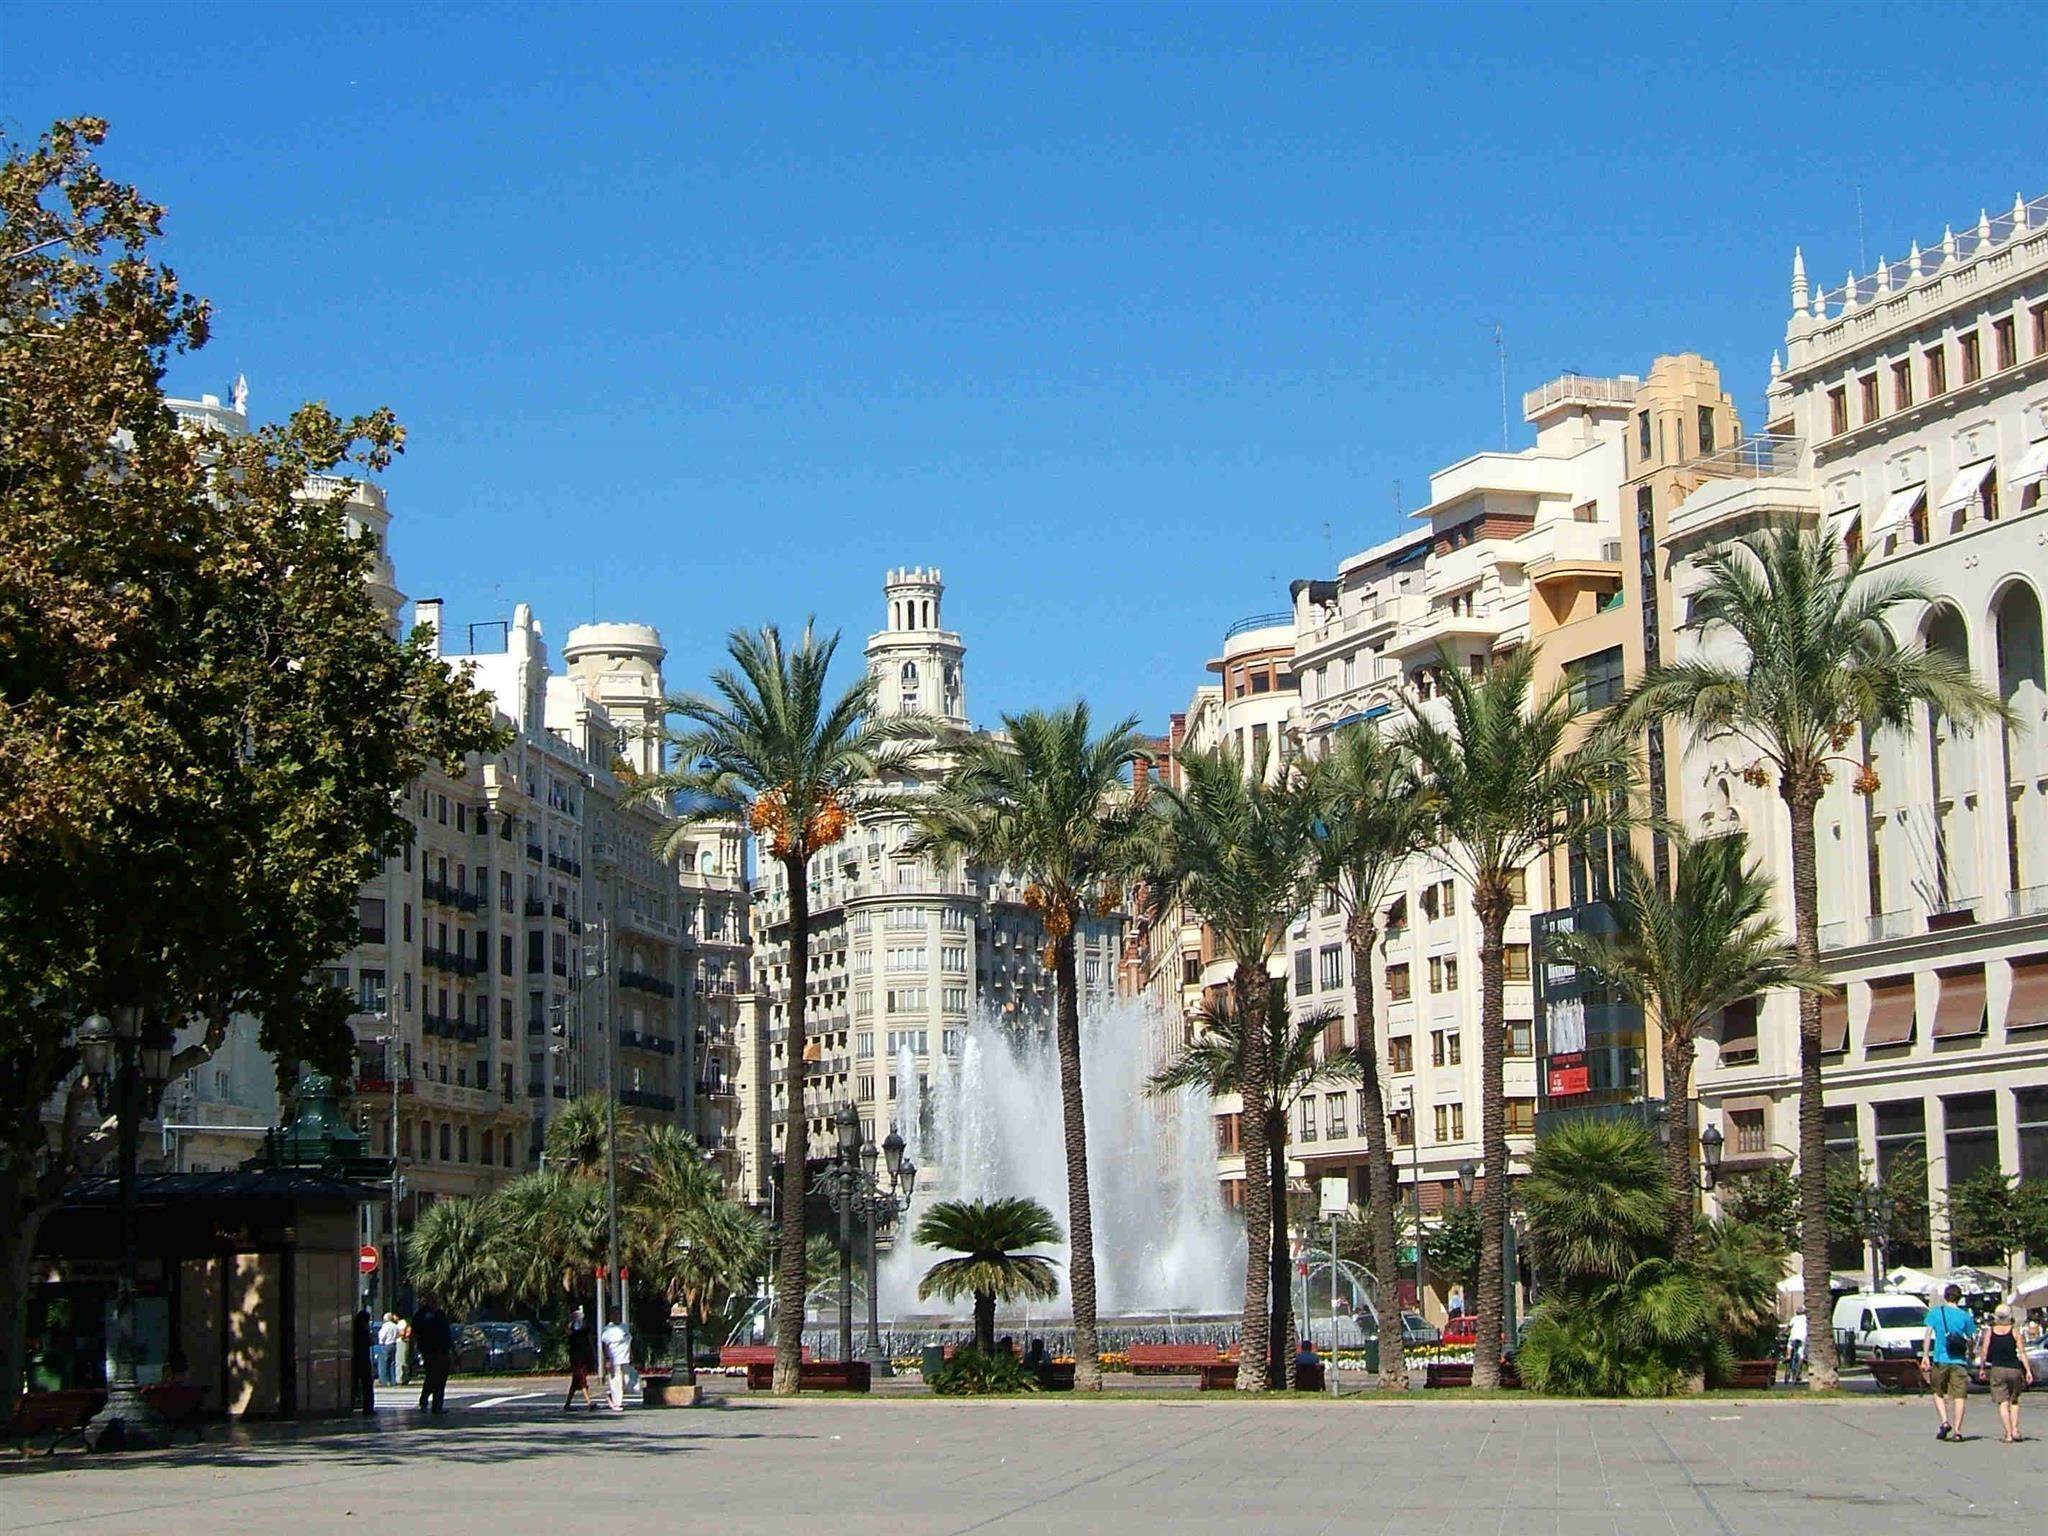 Büyük Ve Yeni İspanya Turu 02, 23 Mart 2020 Hareket…